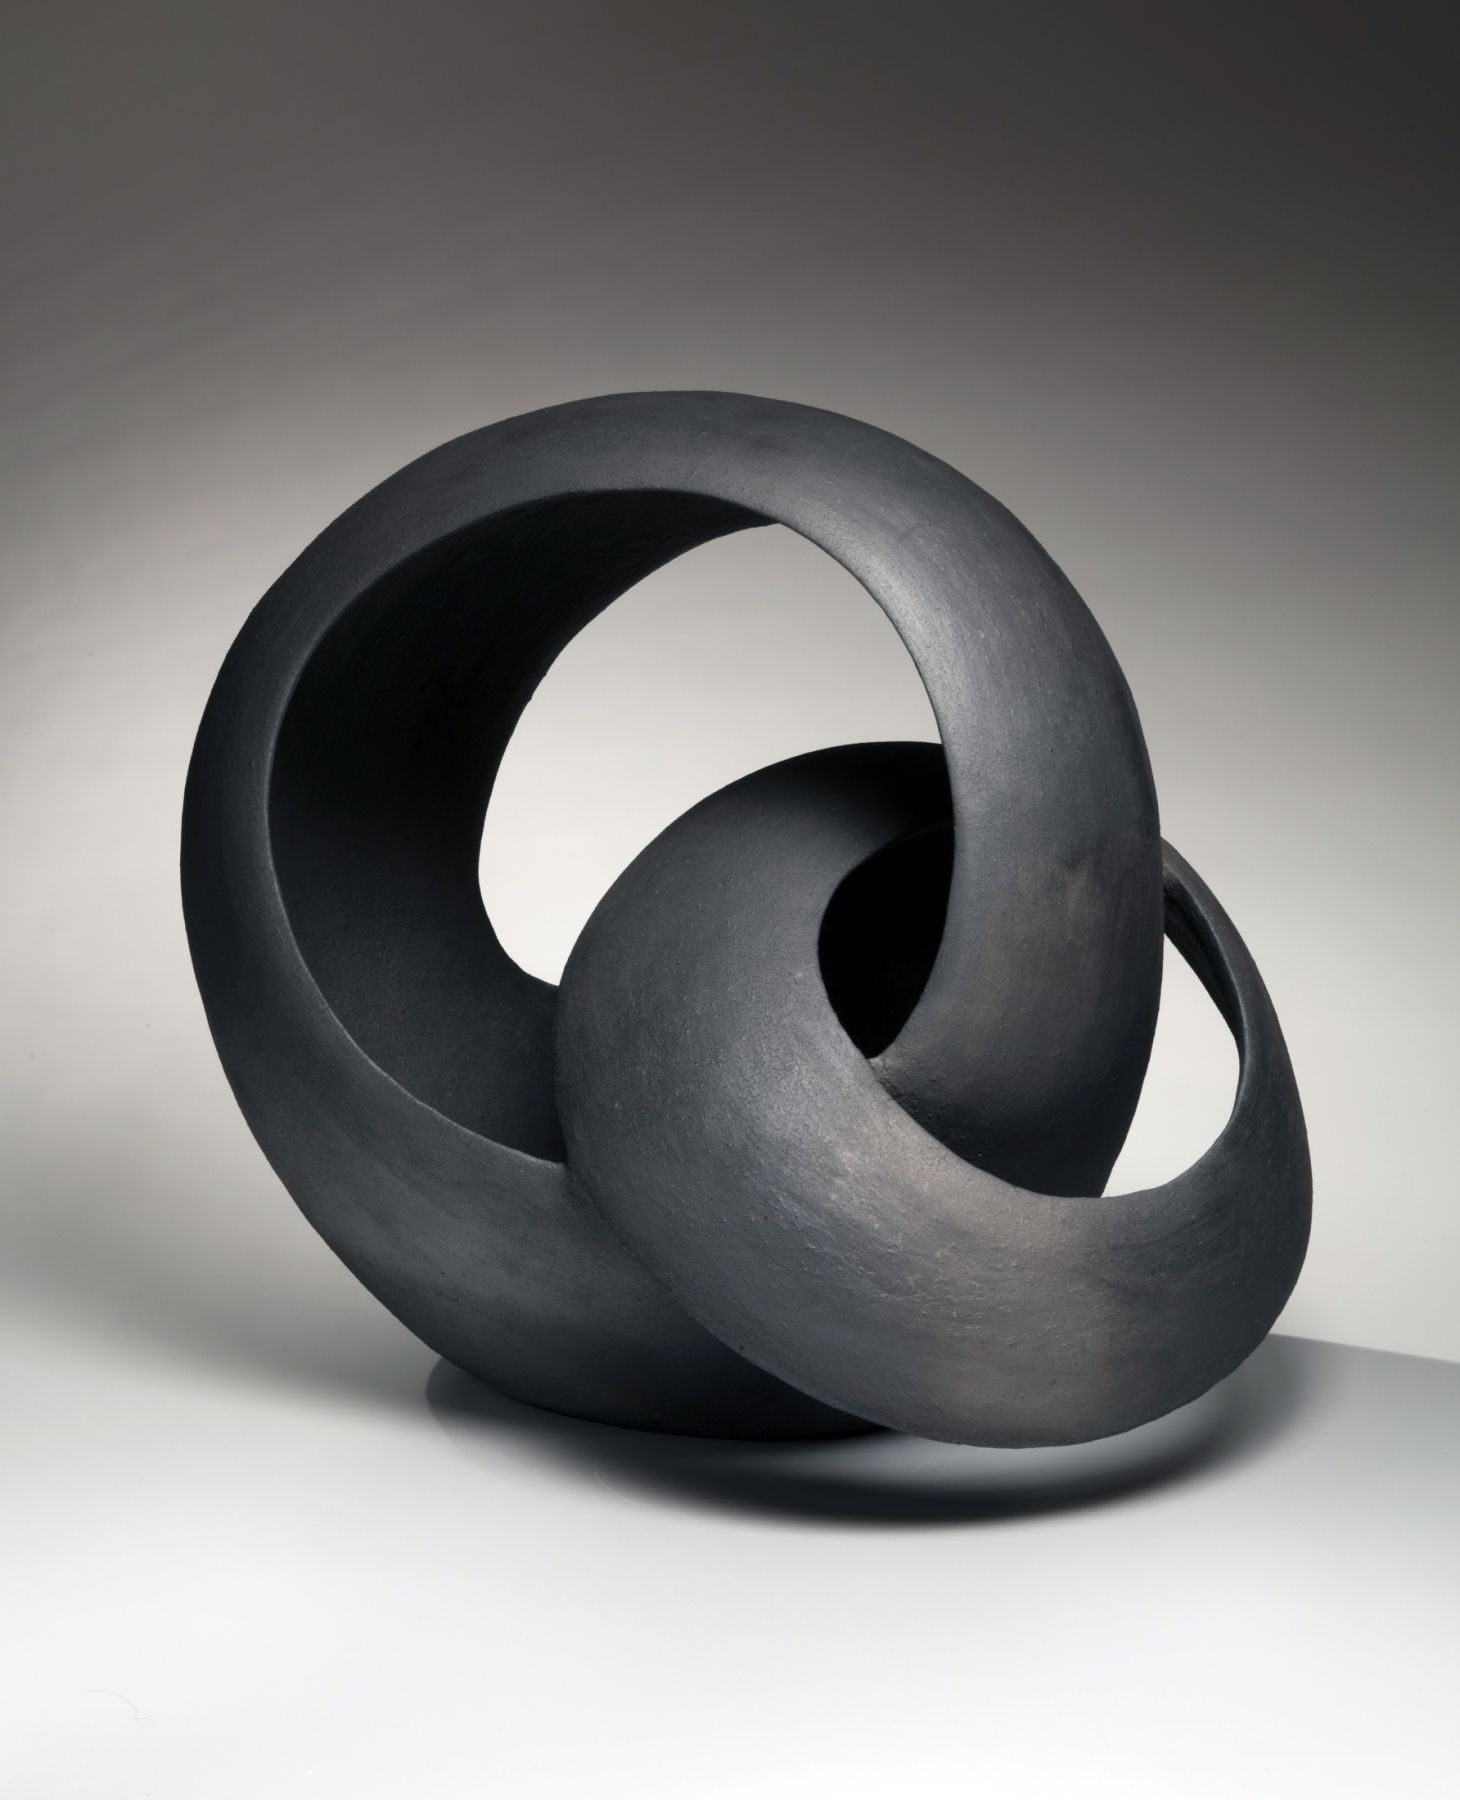 Kurokawa Tōru (b. 1984), Black sculpture of two interlaced rings